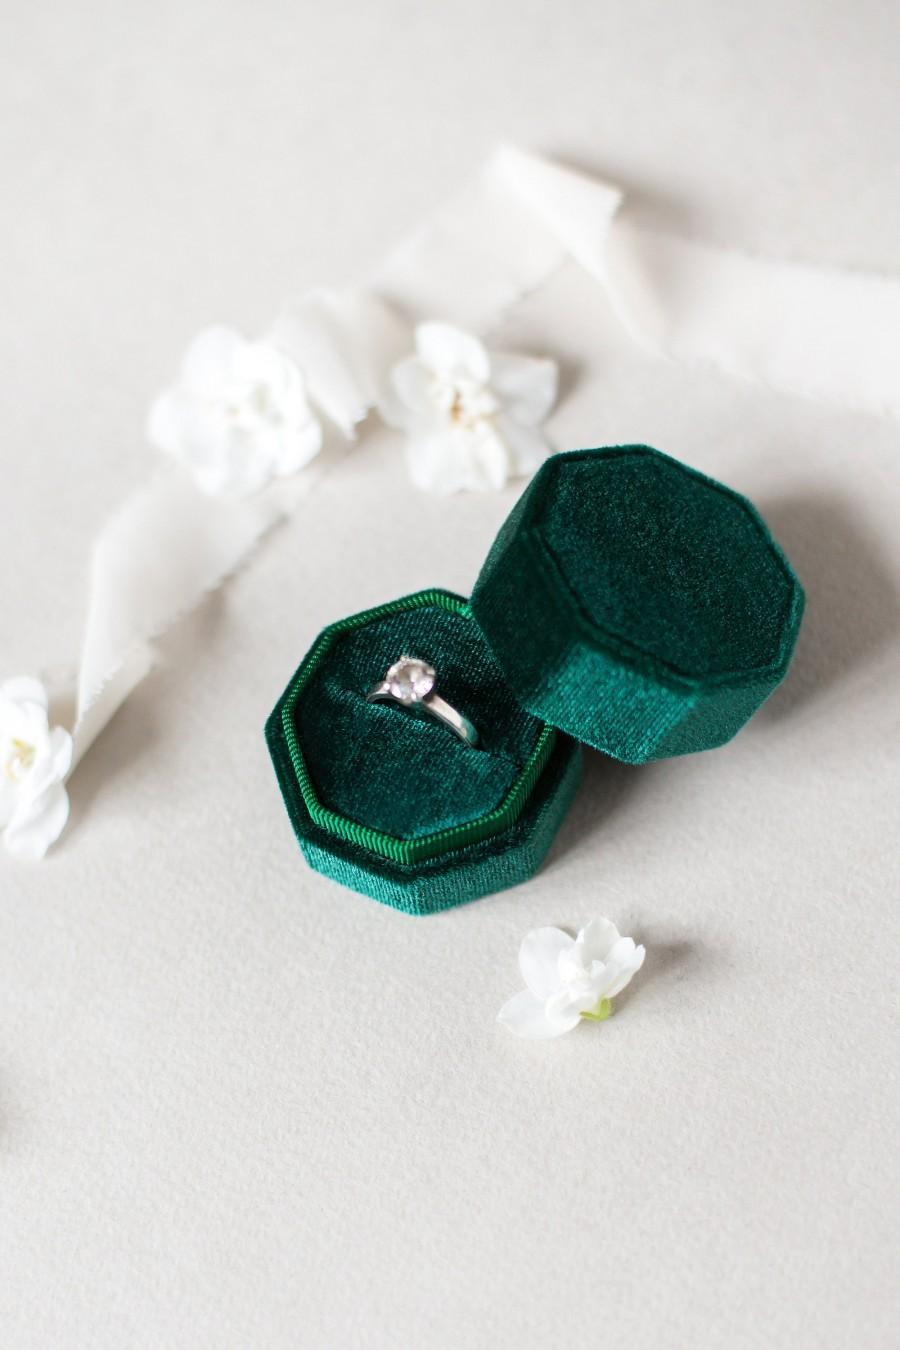 Mariage - Velvet Box, Proposal ring box, Wedding ring box, Octagon, Royal Emerald